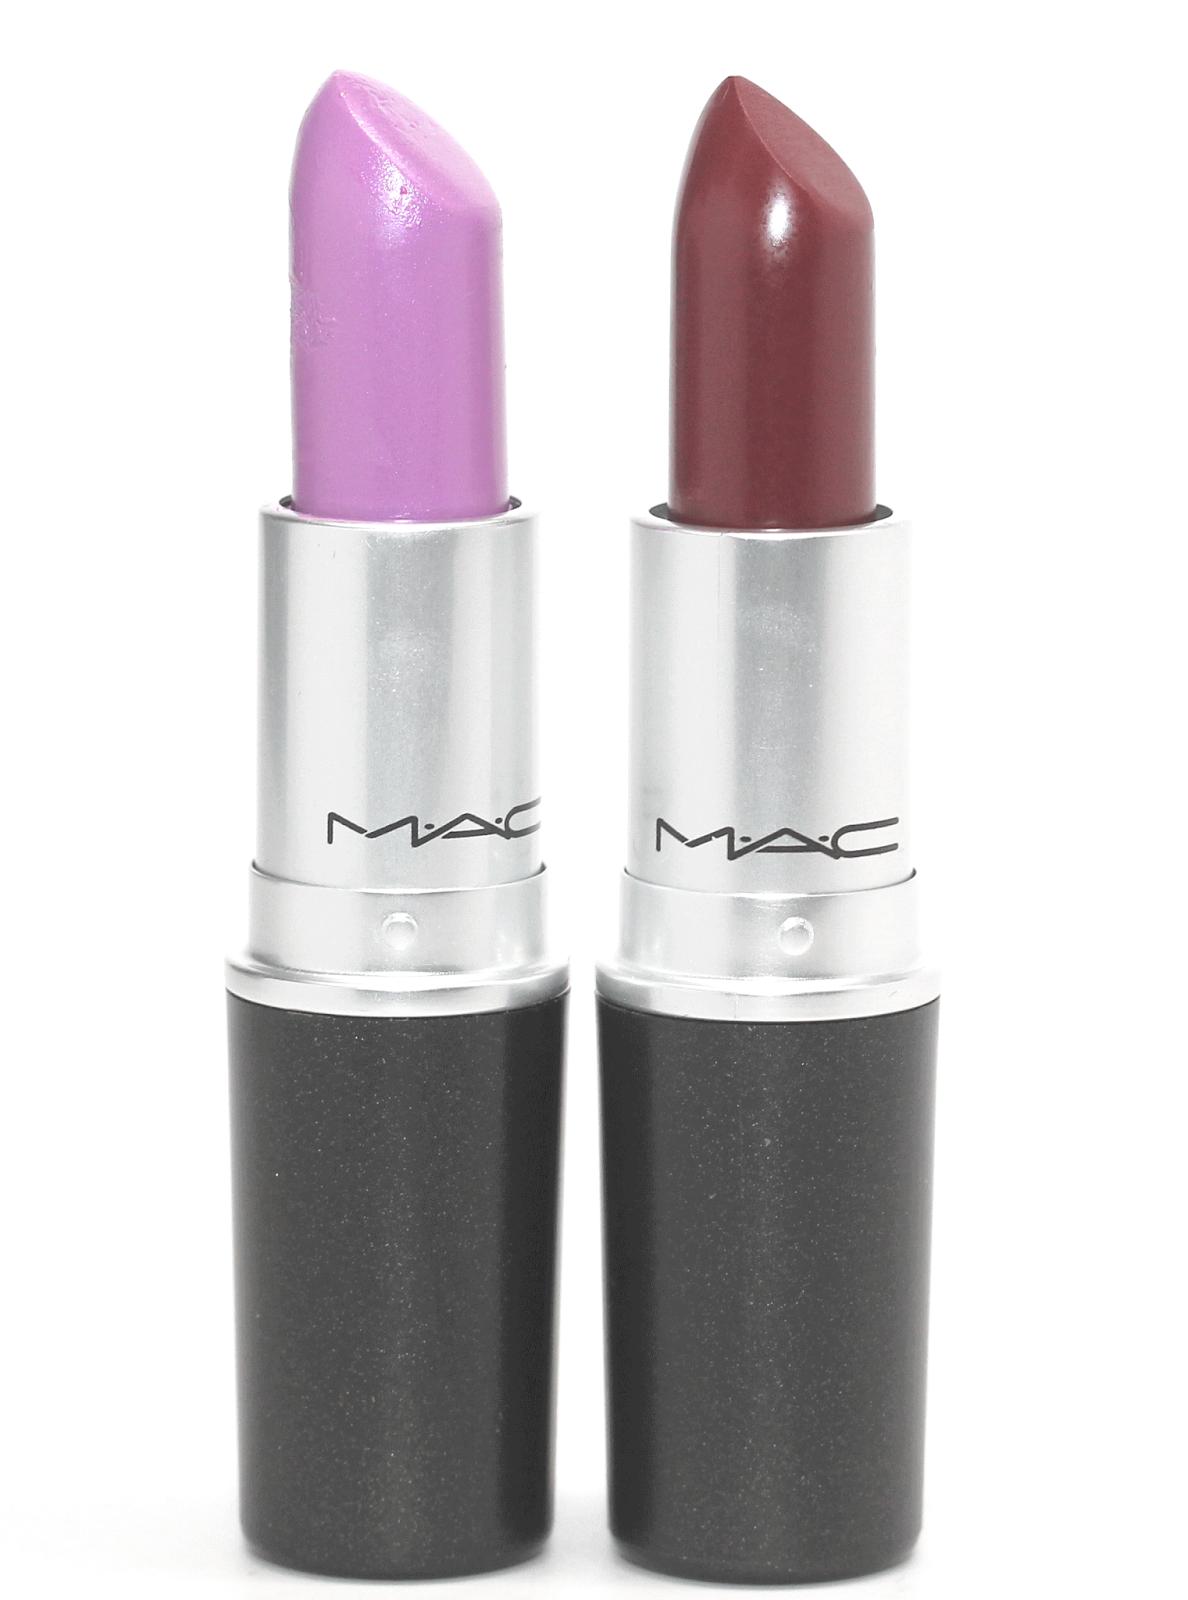 Makeup, Beauty & Fashion: MAC COSMETICS LIPSTICK COLLECTION